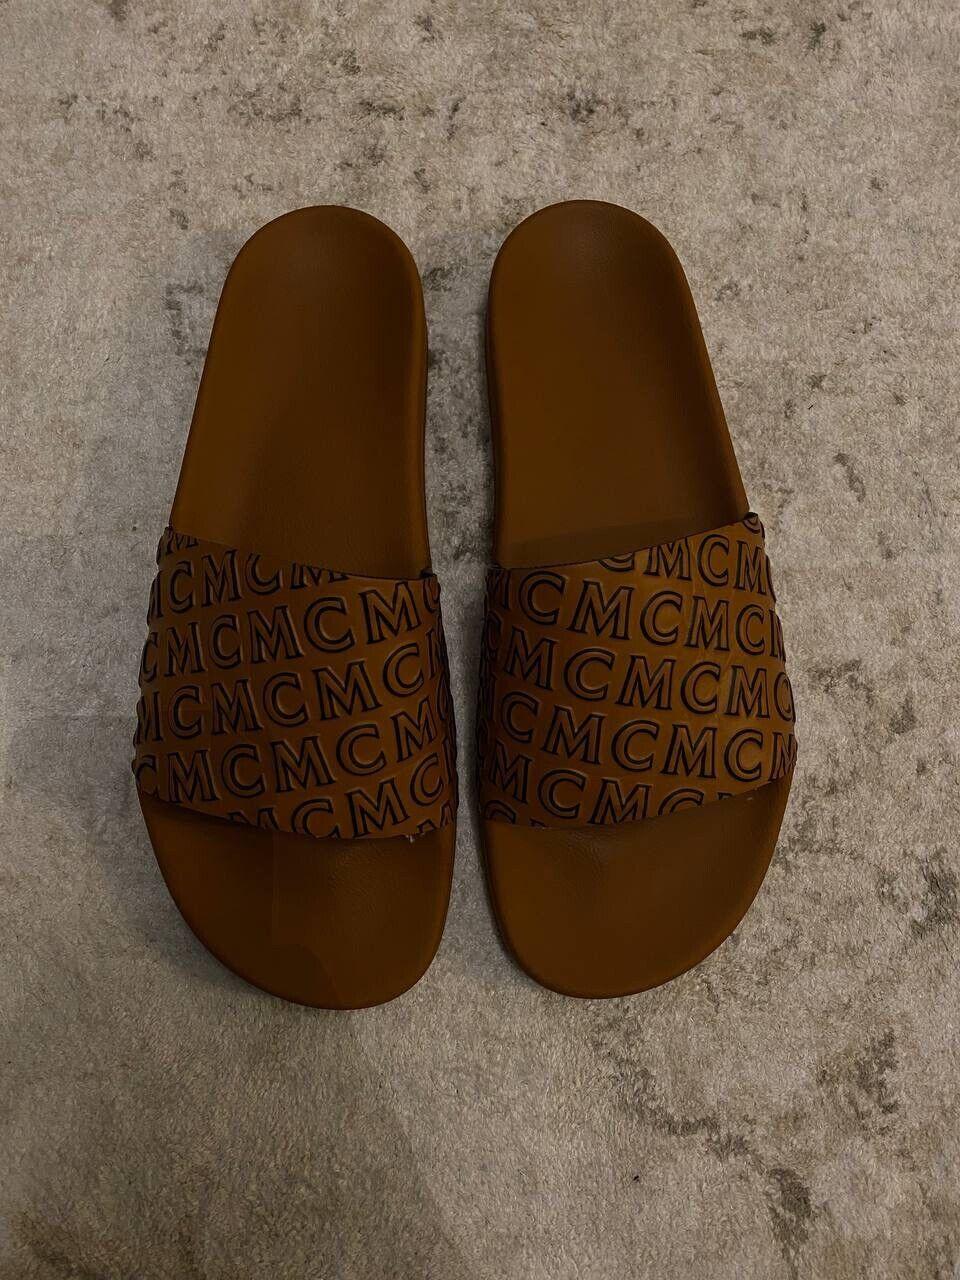 Authentic Rare MCM Slides / Slippers / Sandals Size US 12 EU 45 Collection 2021